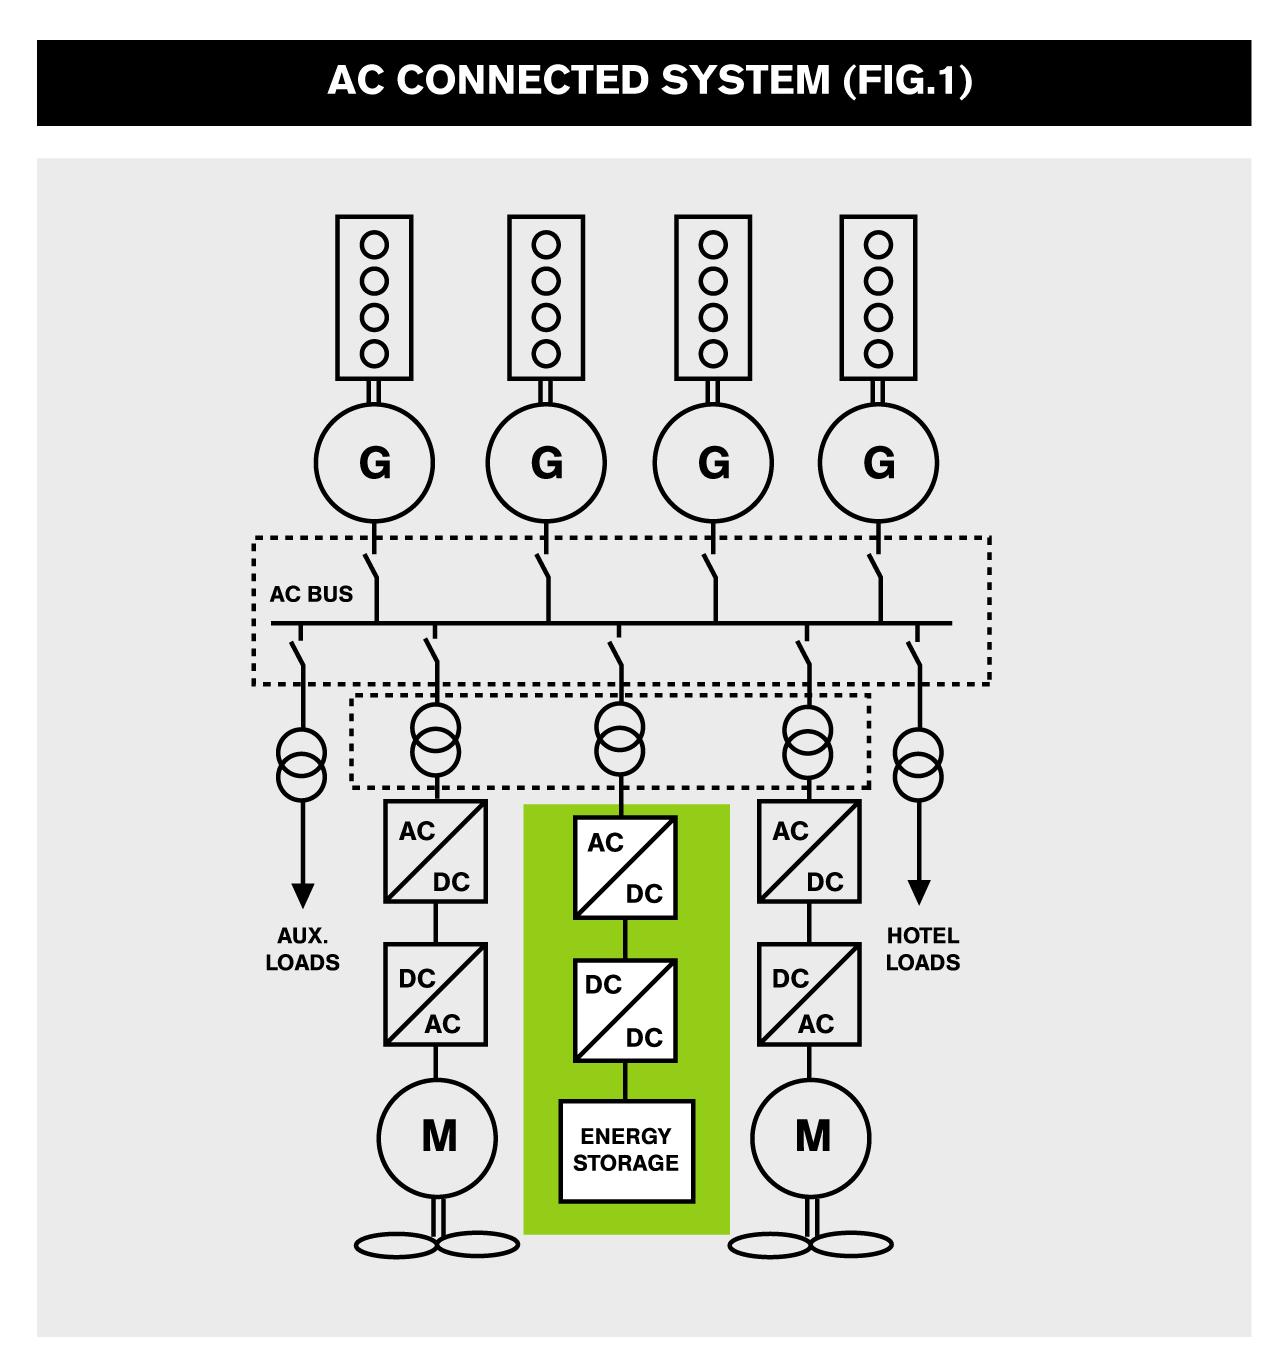 Amazing Ac Dc Symbol Model - Electric Circuit Diagrams - studiomotiv.net